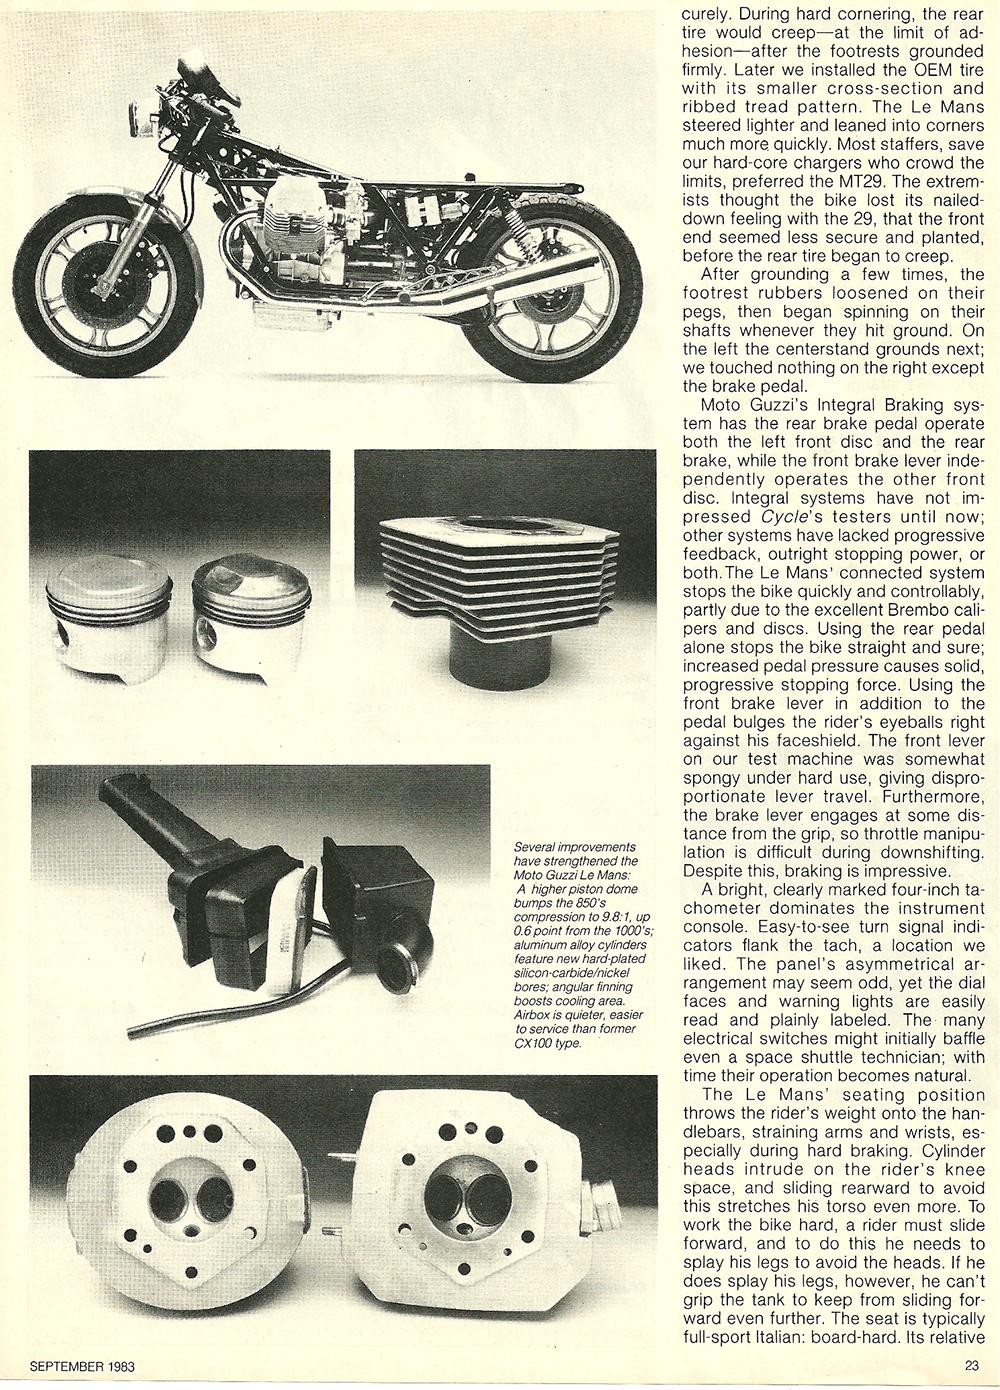 1983 Moto Guzzi 850 Lemans 3 road test 6.jpg